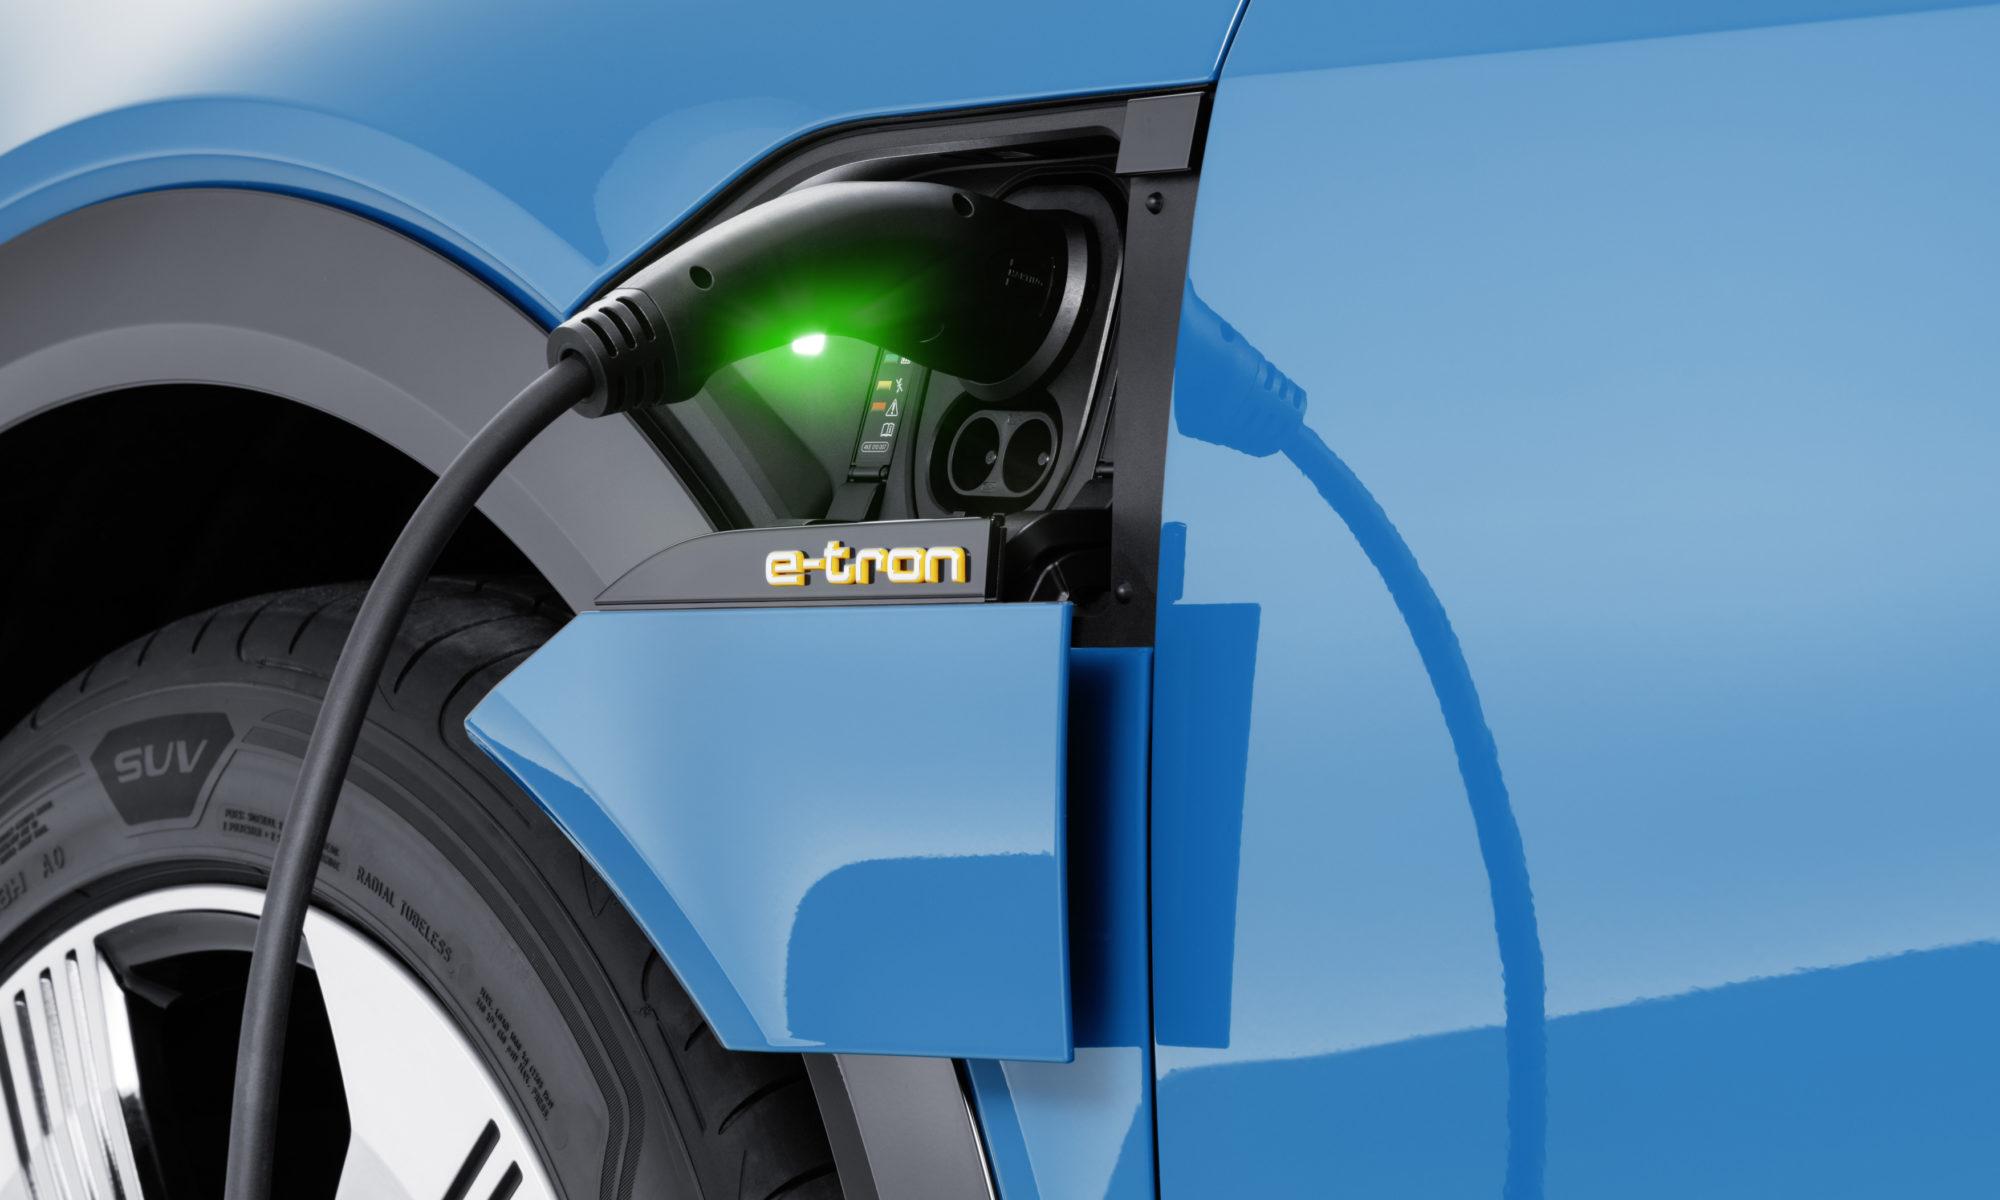 Audi e-tron Ladeklappe